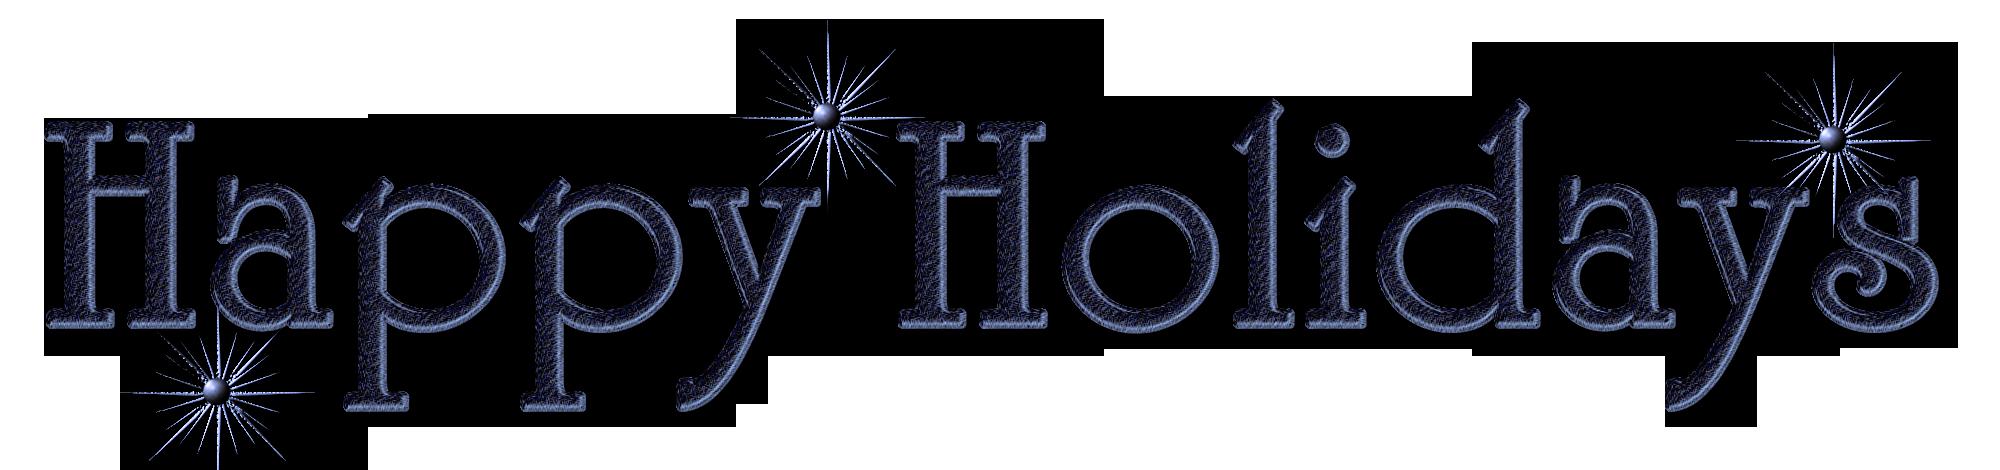 Holiday clipart holiday season. Happy holidays png by